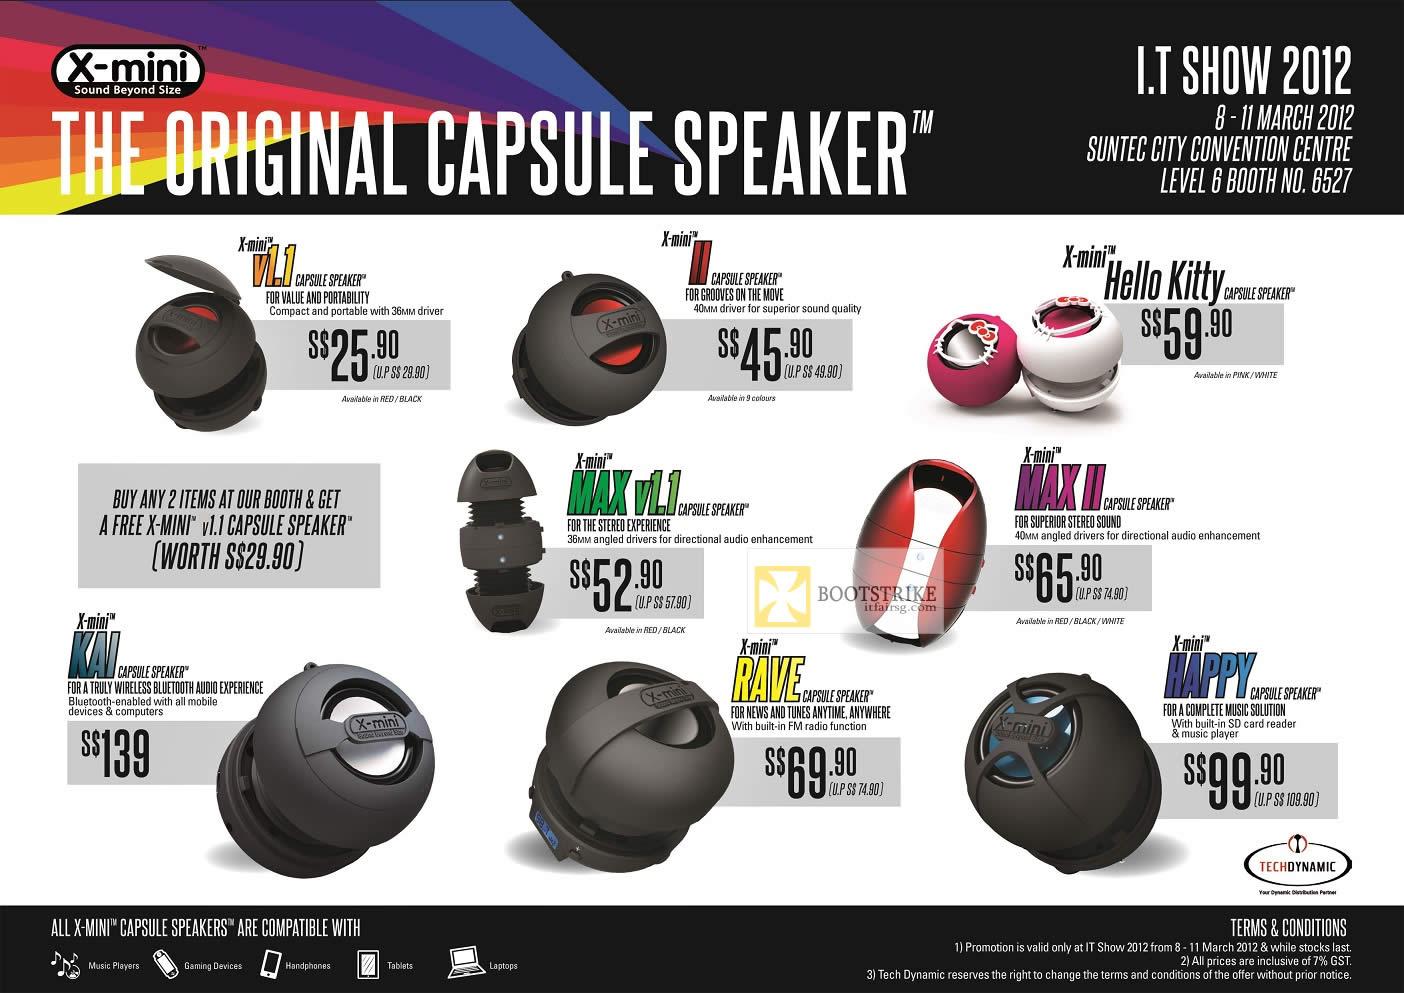 IT SHOW 2012 price list image brochure of Tech Dynamic X-Mini Capsule Speakers V1.1, II, Hello Kitty, Max II, Max V1.1, Kai, Rave, Happy